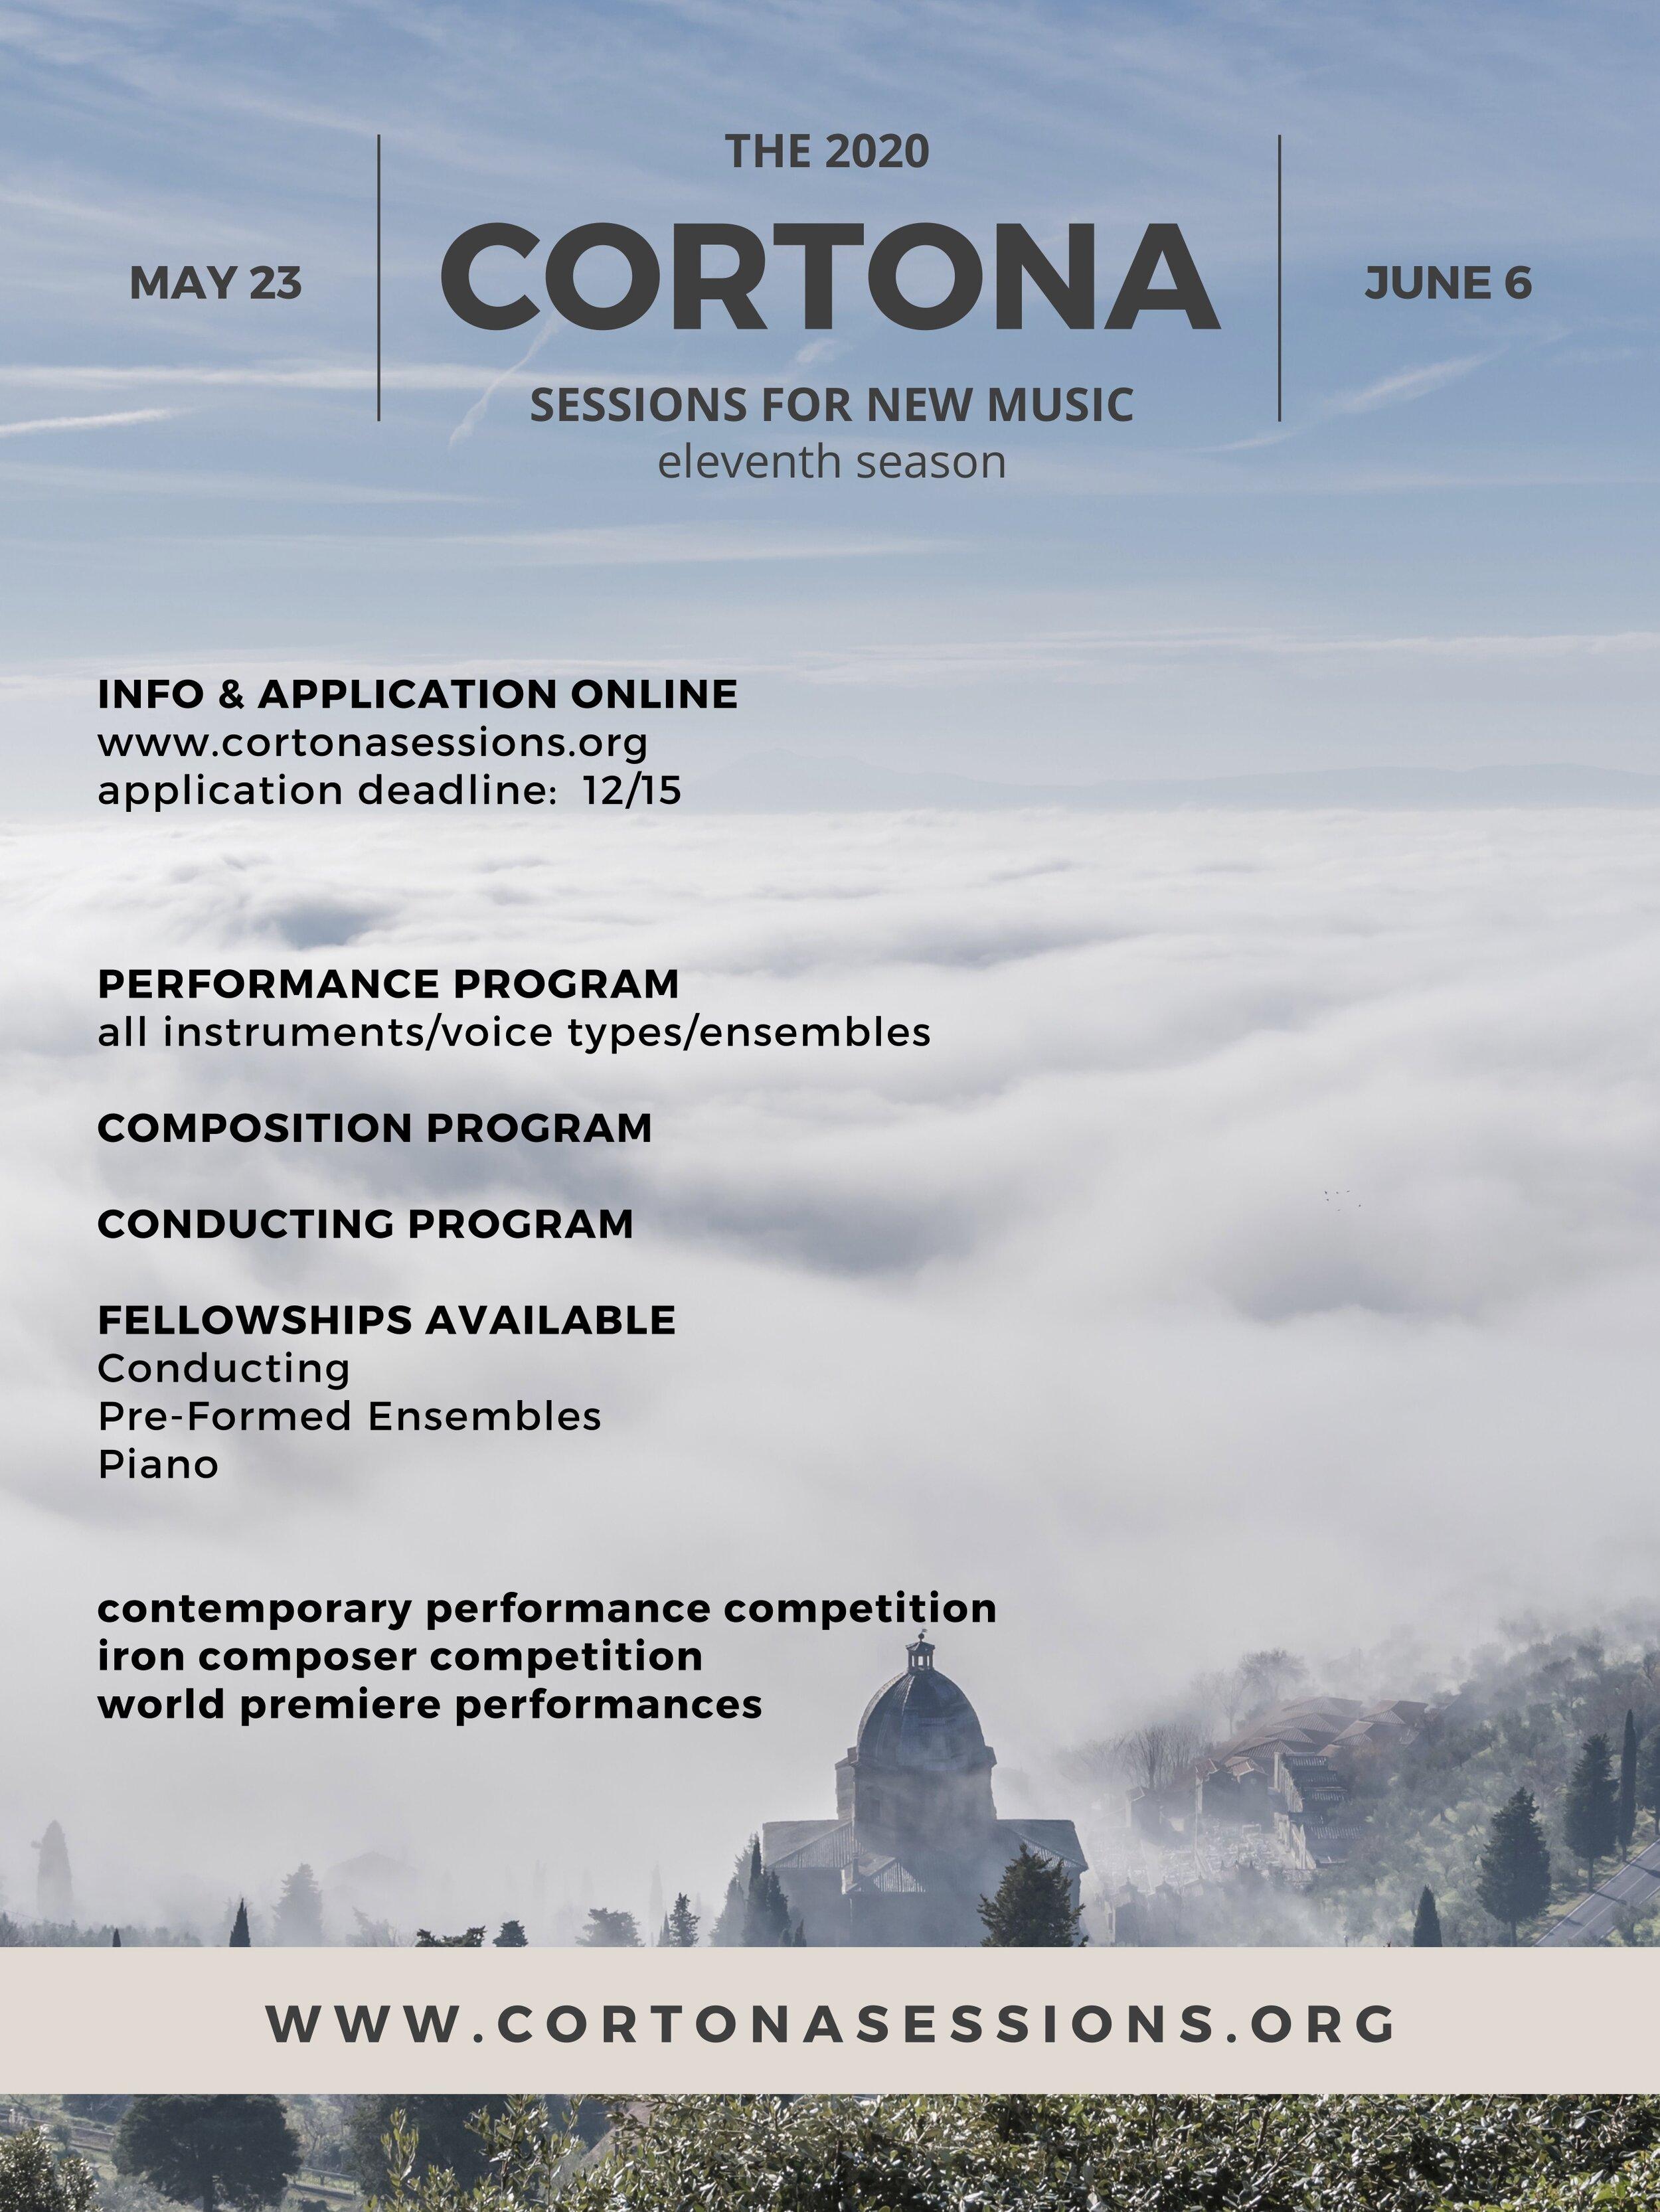 Cortona 2020 Poster.jpg